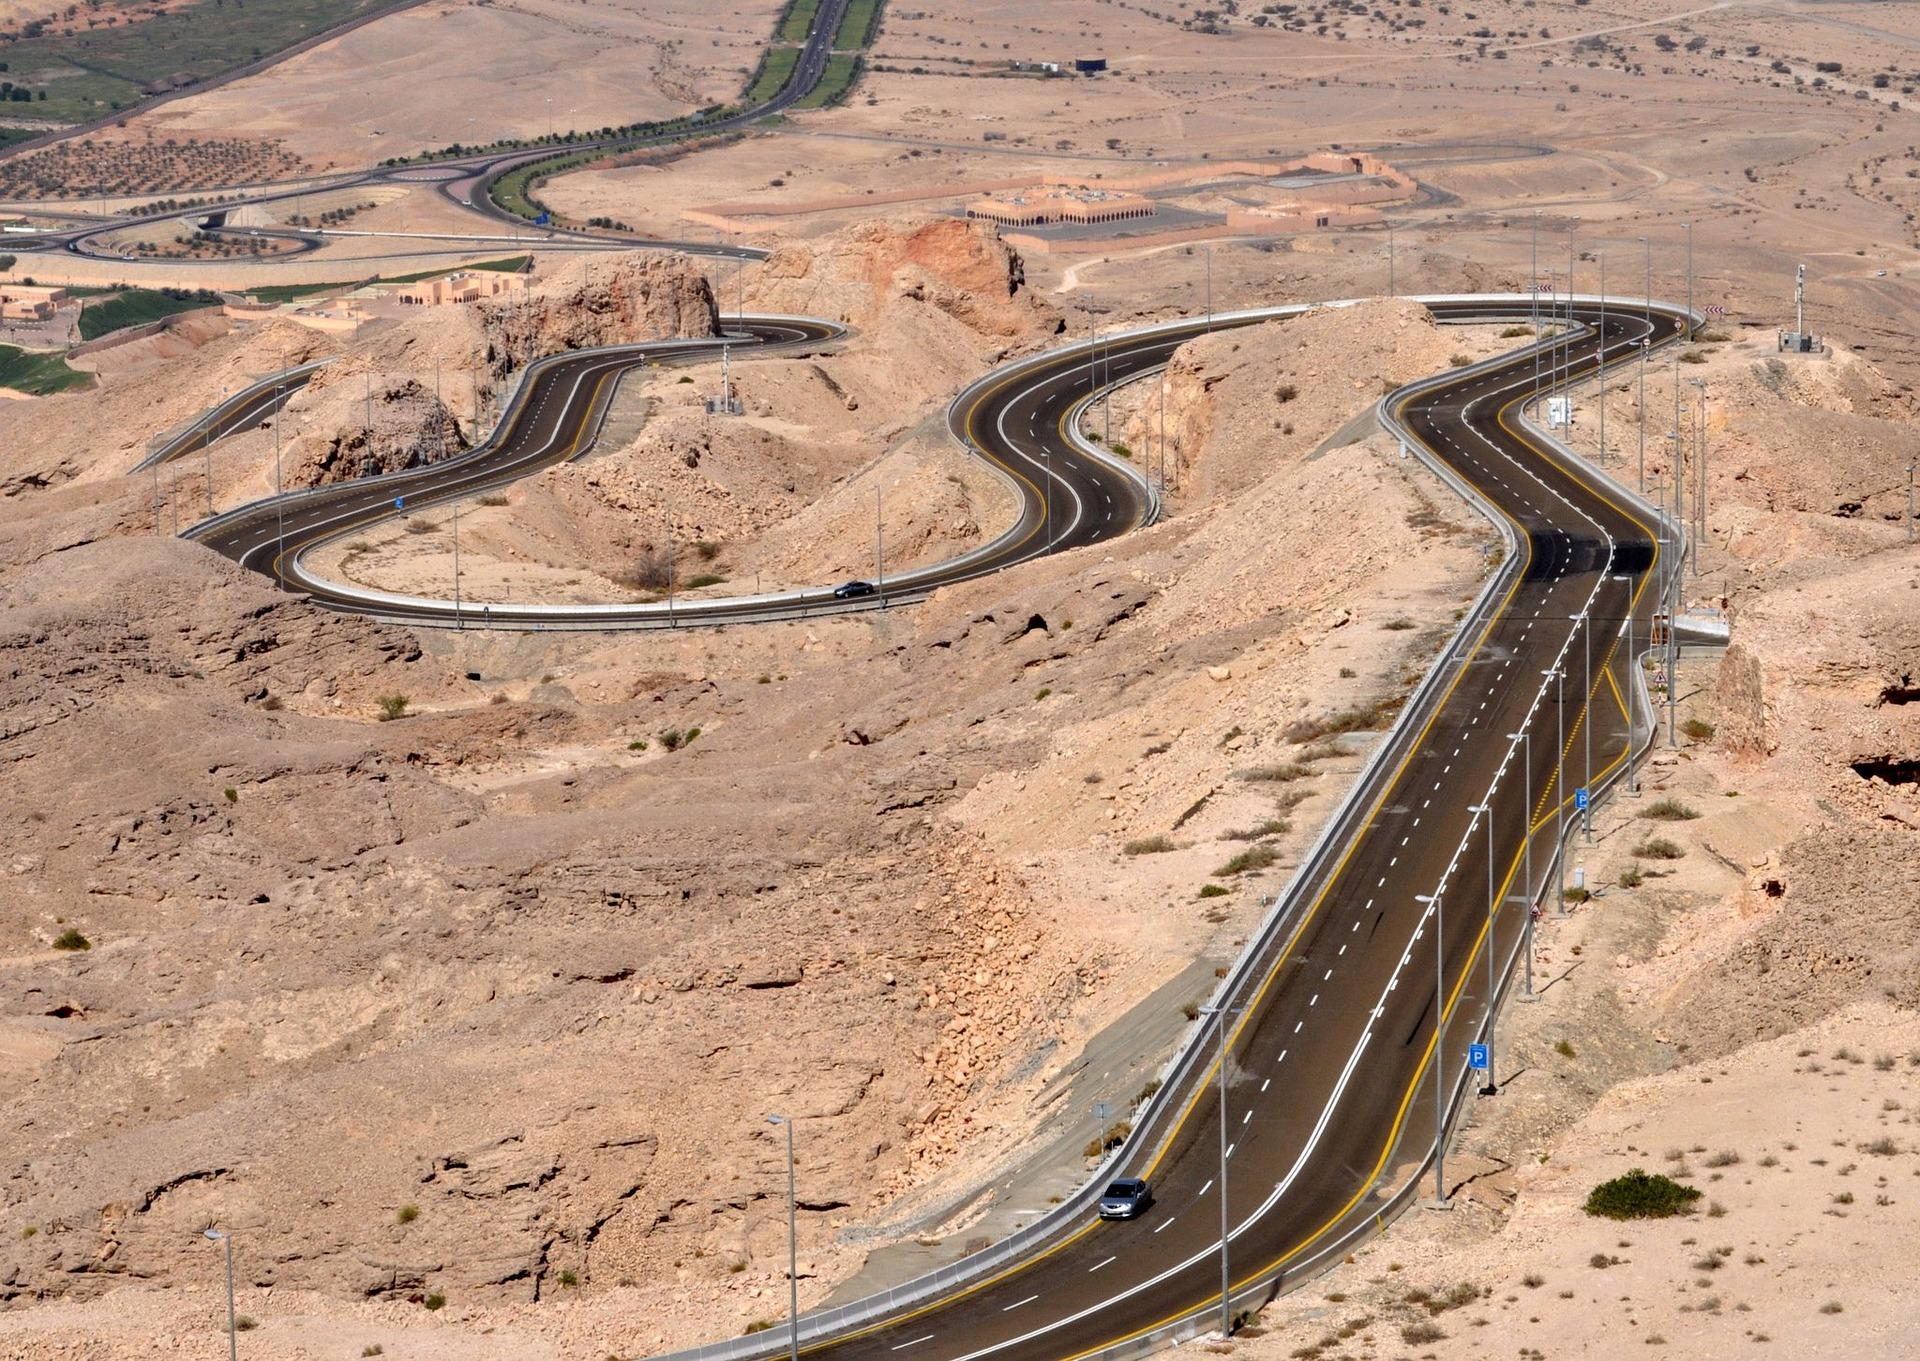 Al Ain mountain - Jebel Hafeet